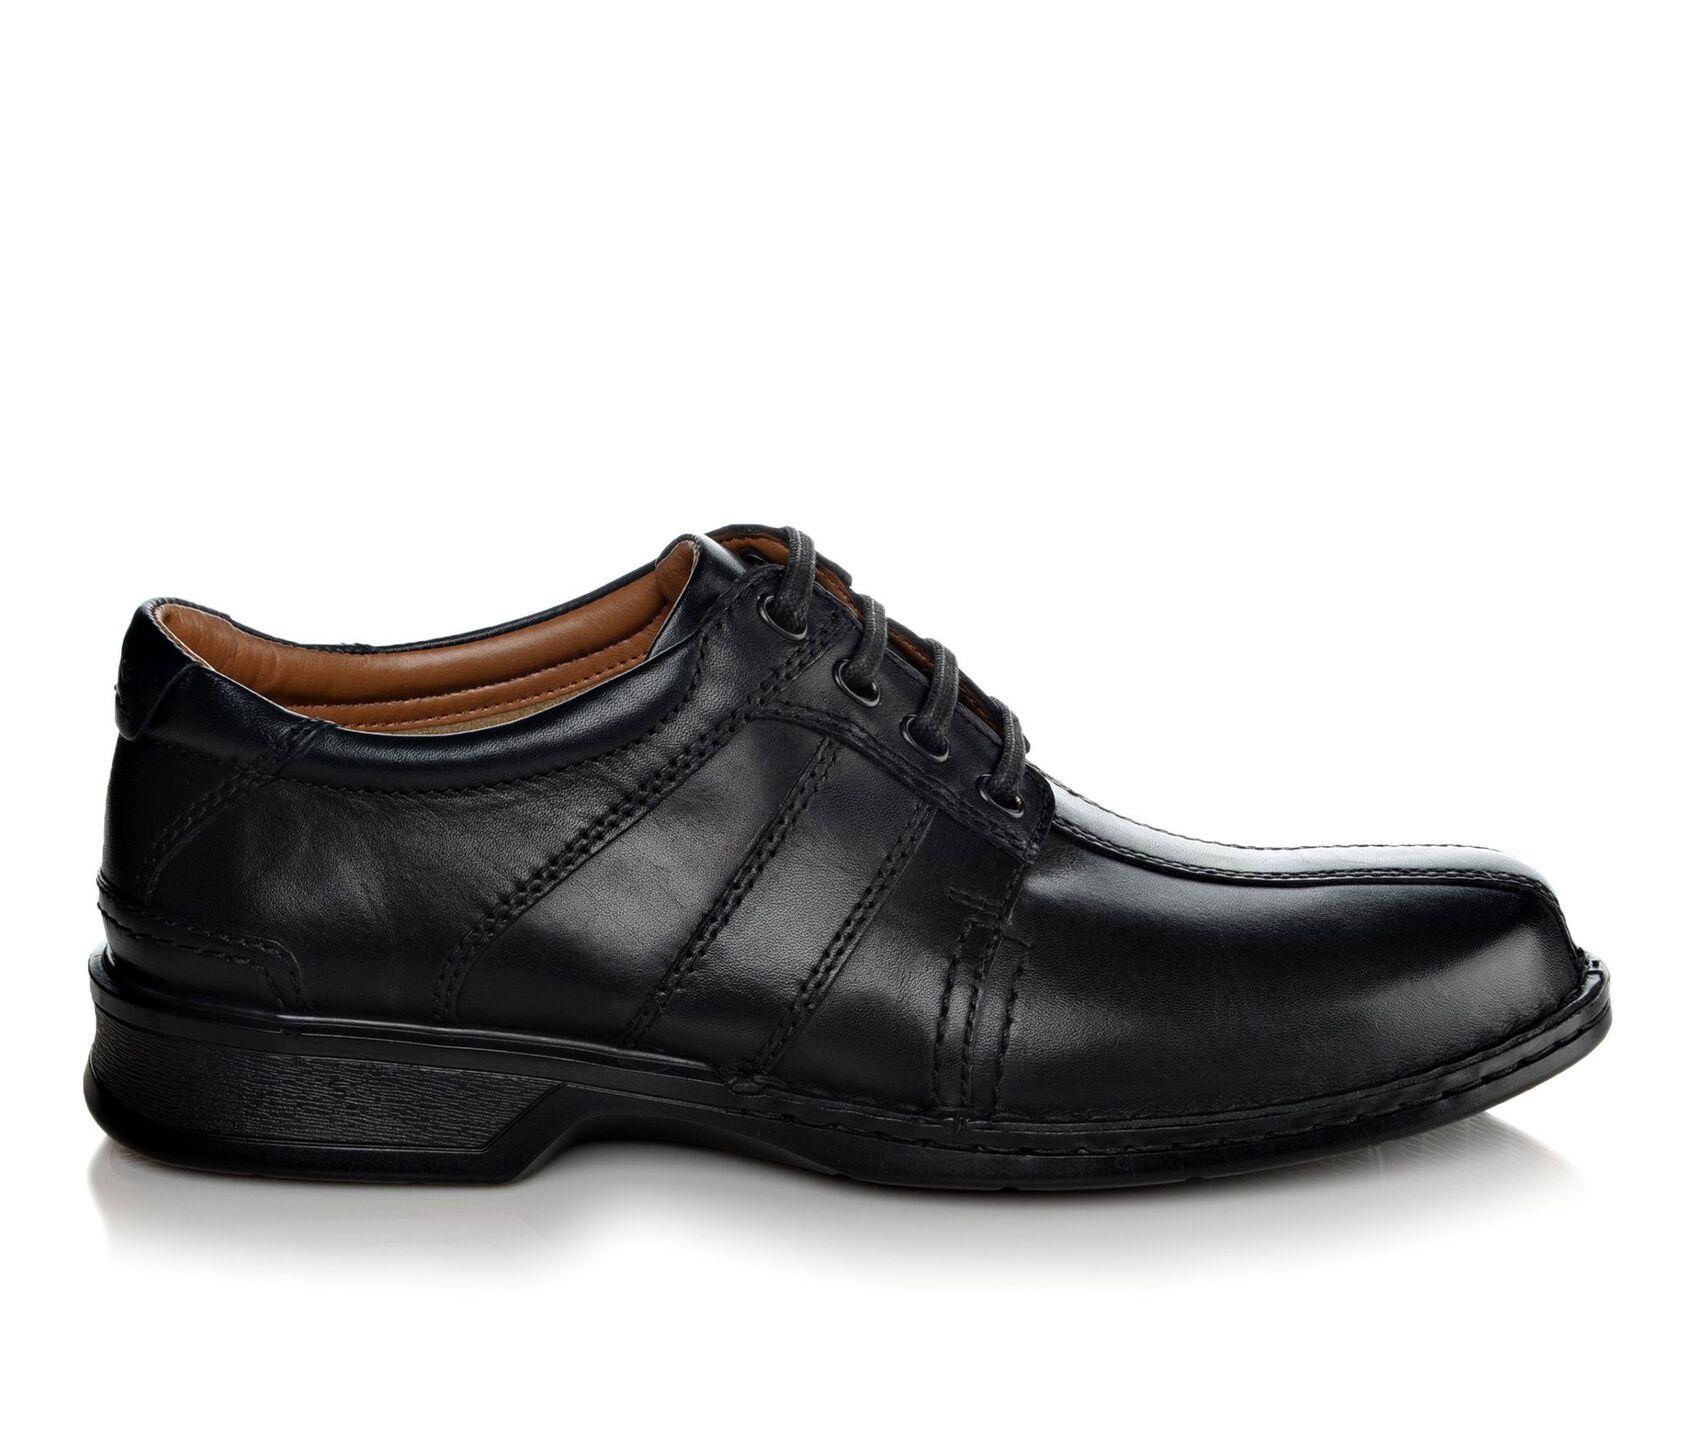 clarks walking shoes reviews style guru fashion glitz